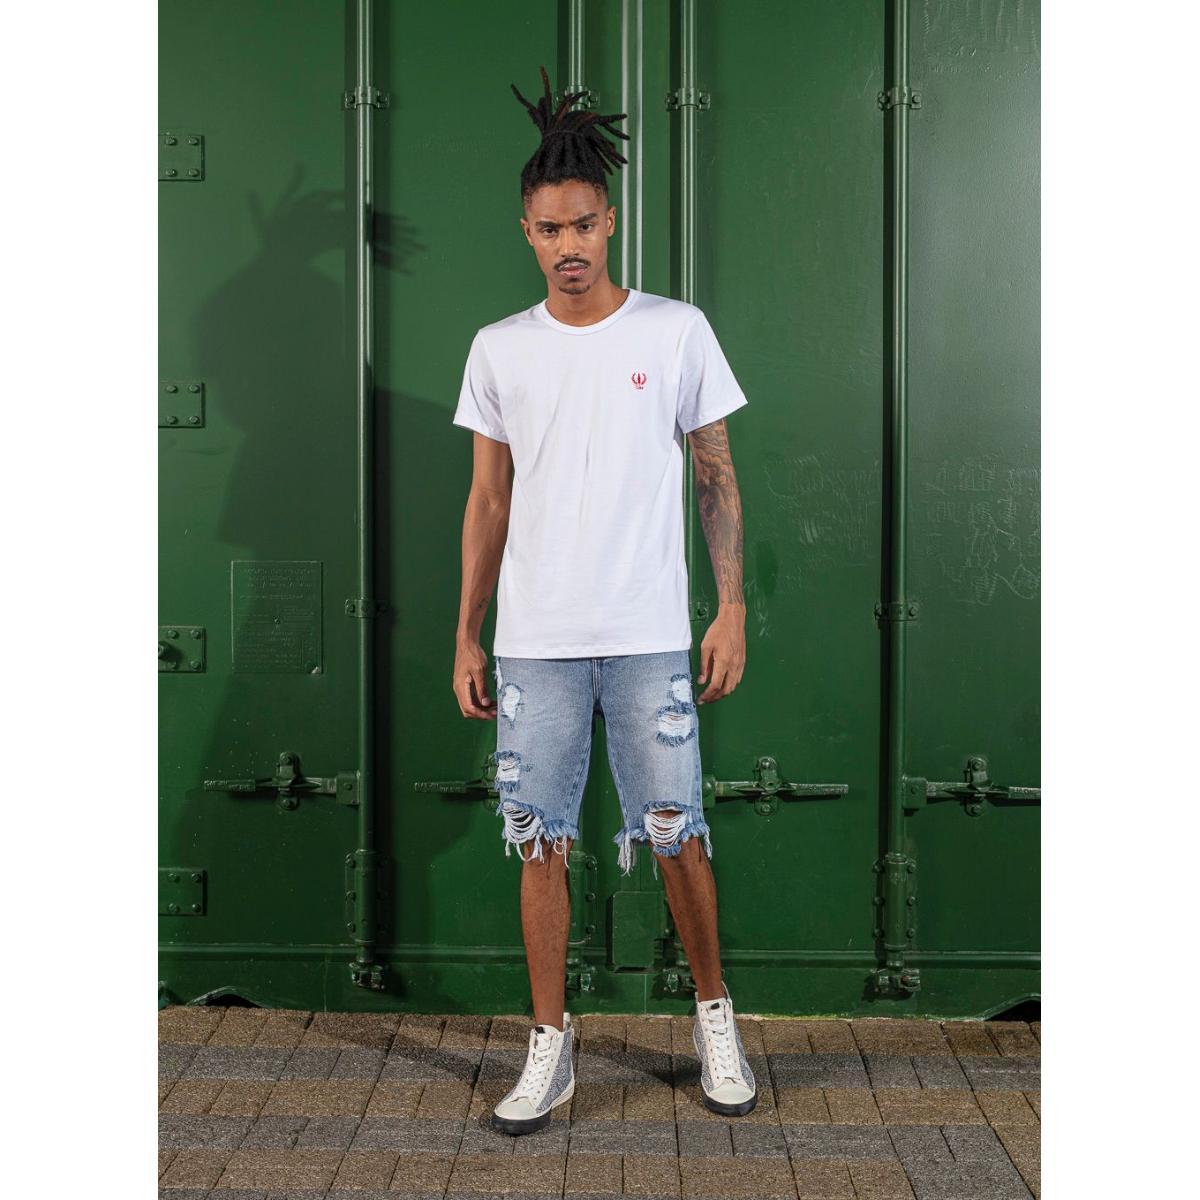 Camiseta Masculina Coca-cola Clothing 353207579 001 Branco